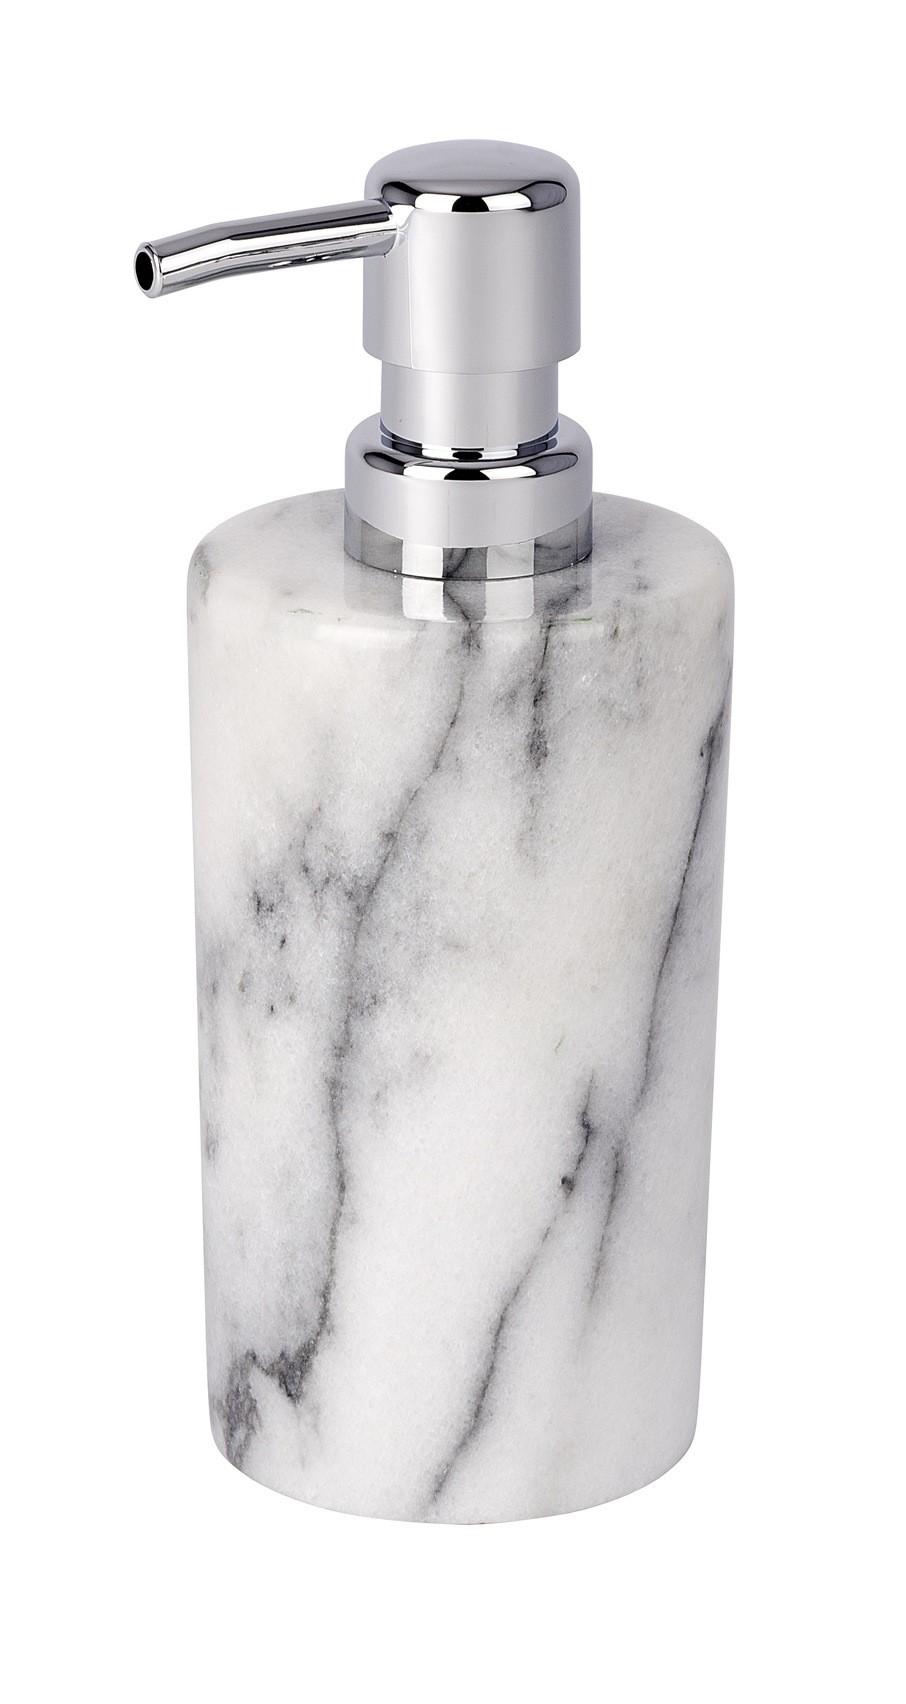 Wenko Seifenspender Onyx, Marmor, 230 ml